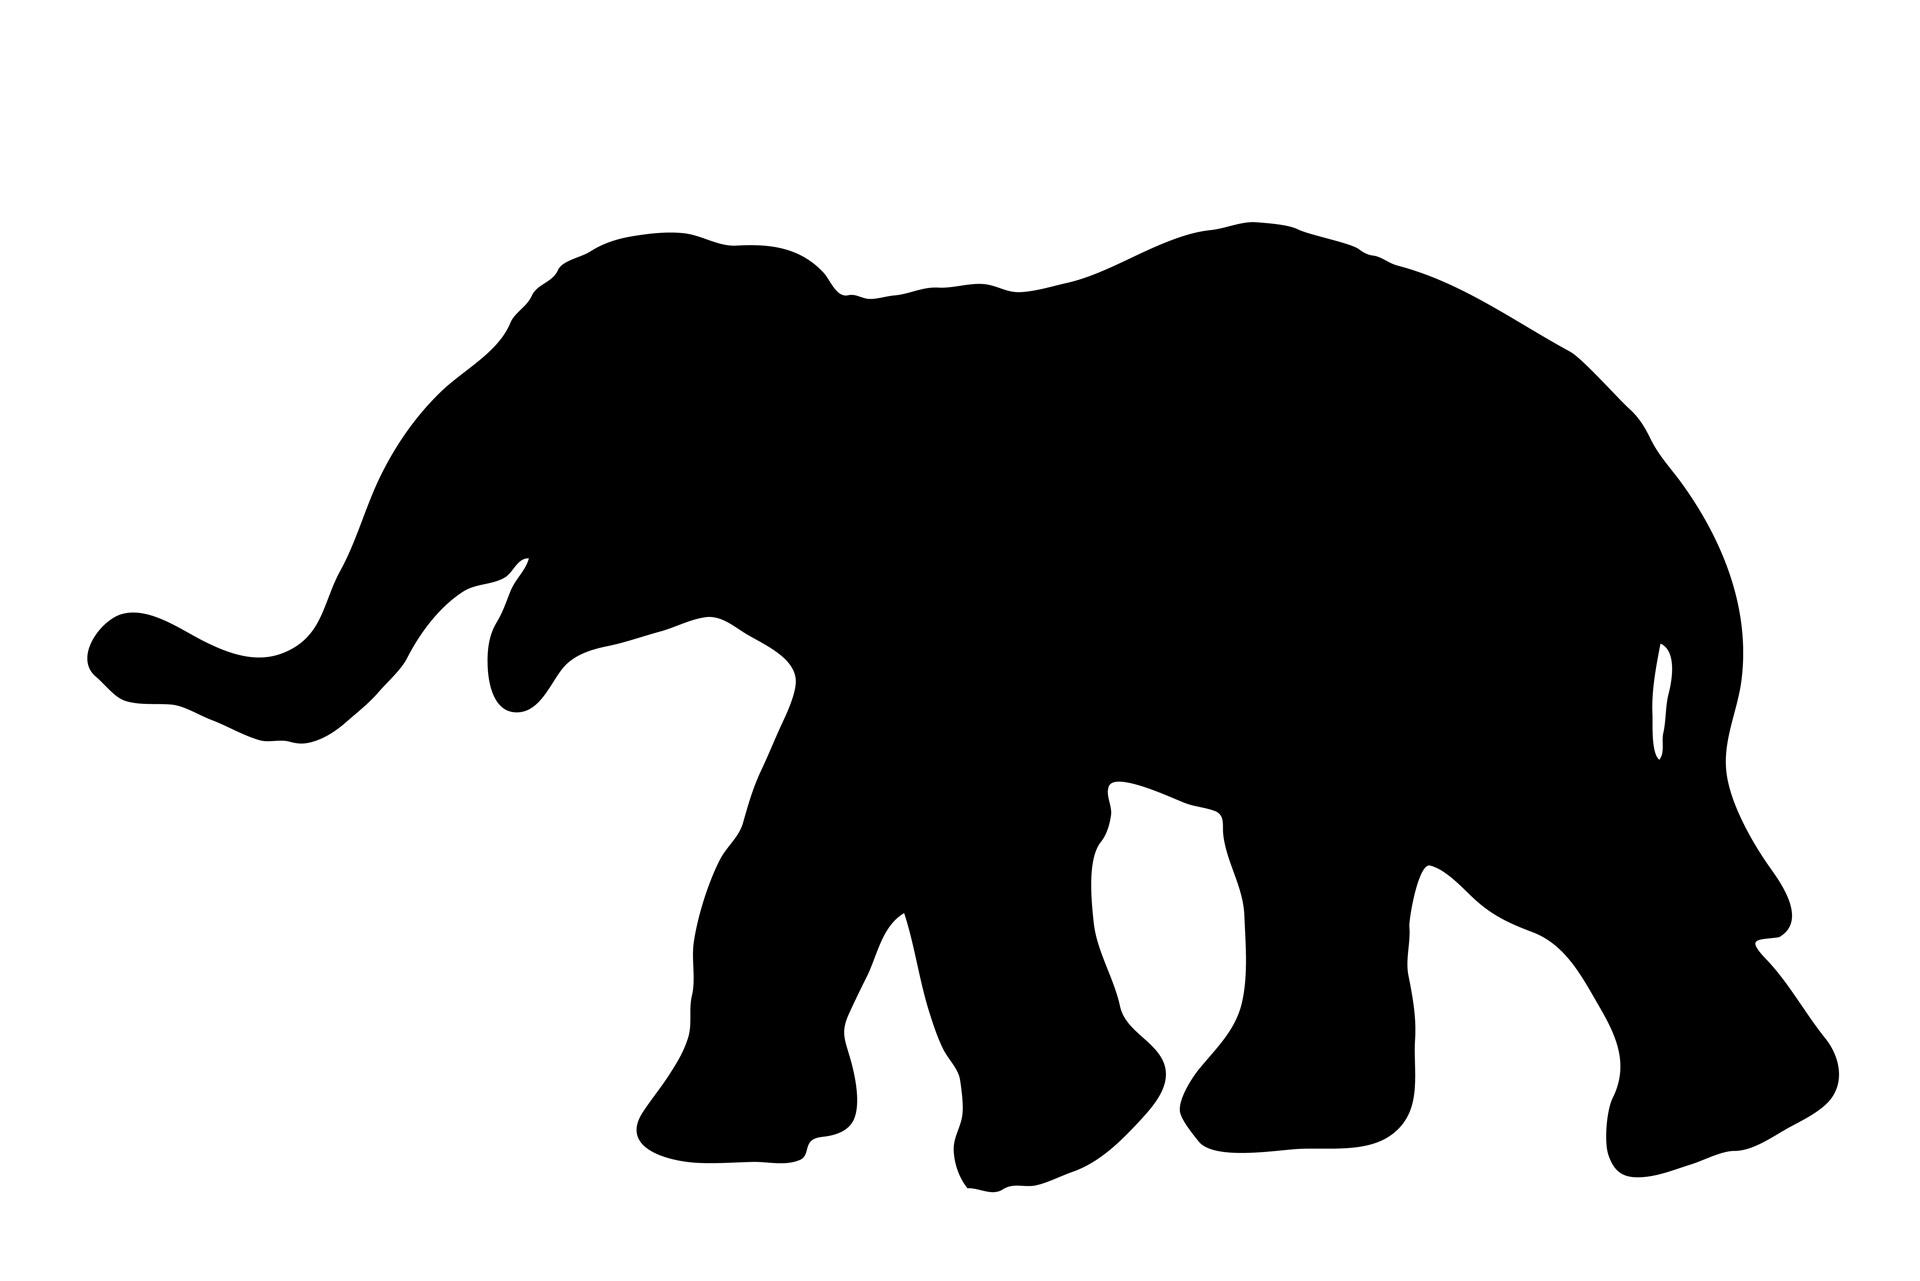 1920x1281 Fresh Elephant Silhouette Skull And Crossbones Image Result